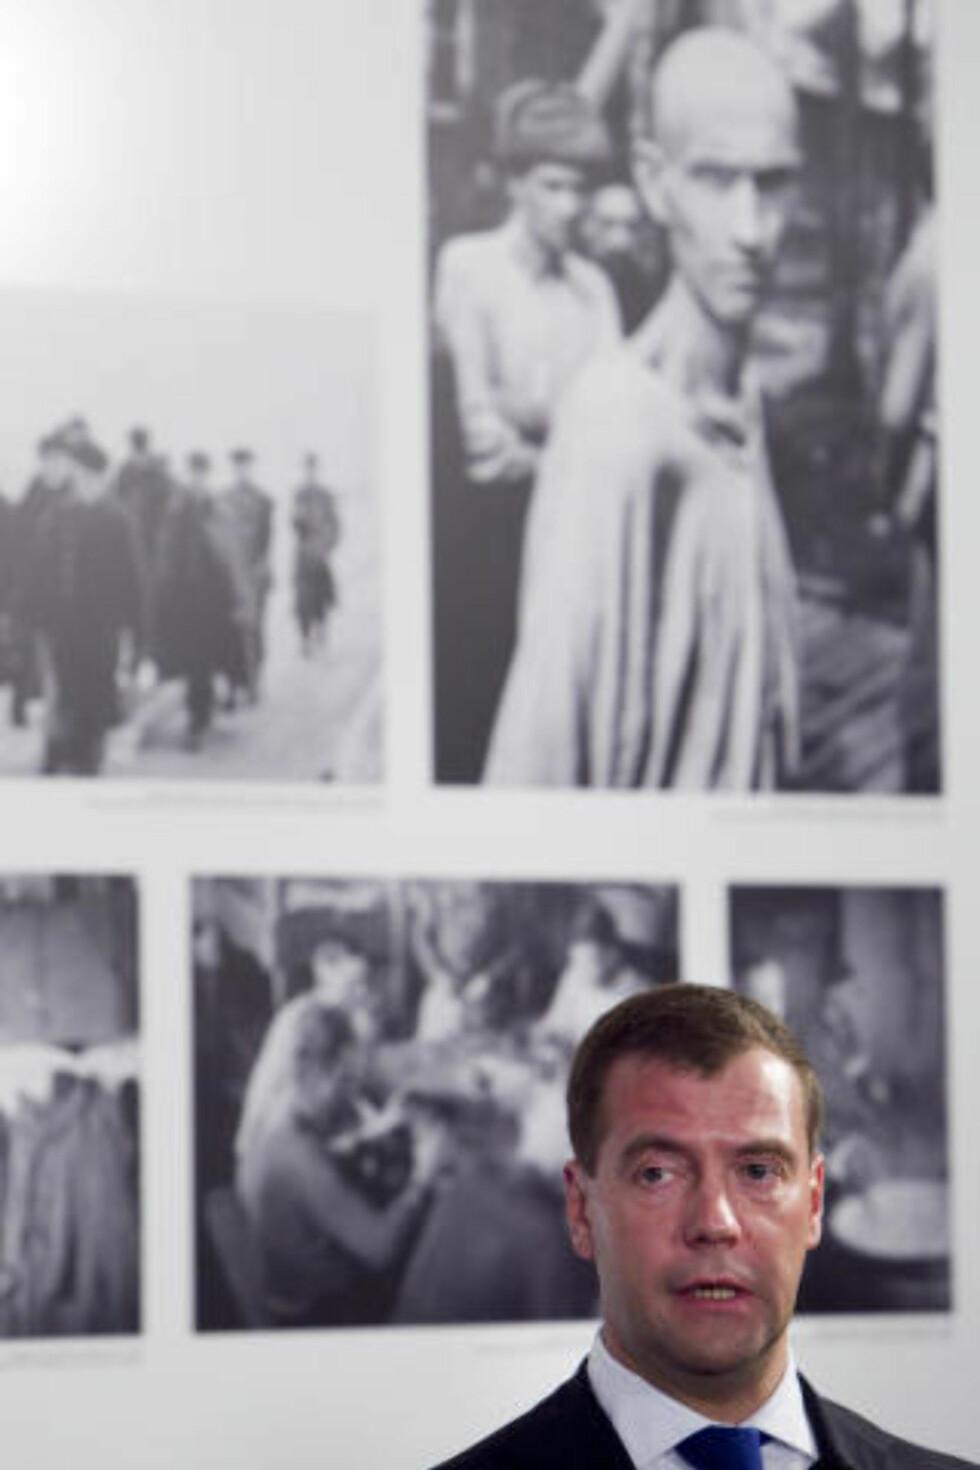 BEVEGET: - Her på norsk jord ble mange fanger og soldater stedt til hvile. Minnet om de falne er hellig for oss, sa en beveget Dimitrij Medvedev, da han fikk se en utsilling som viste historien til de sovjetiske krigsfangene i Norge. Foto: SCANPIX